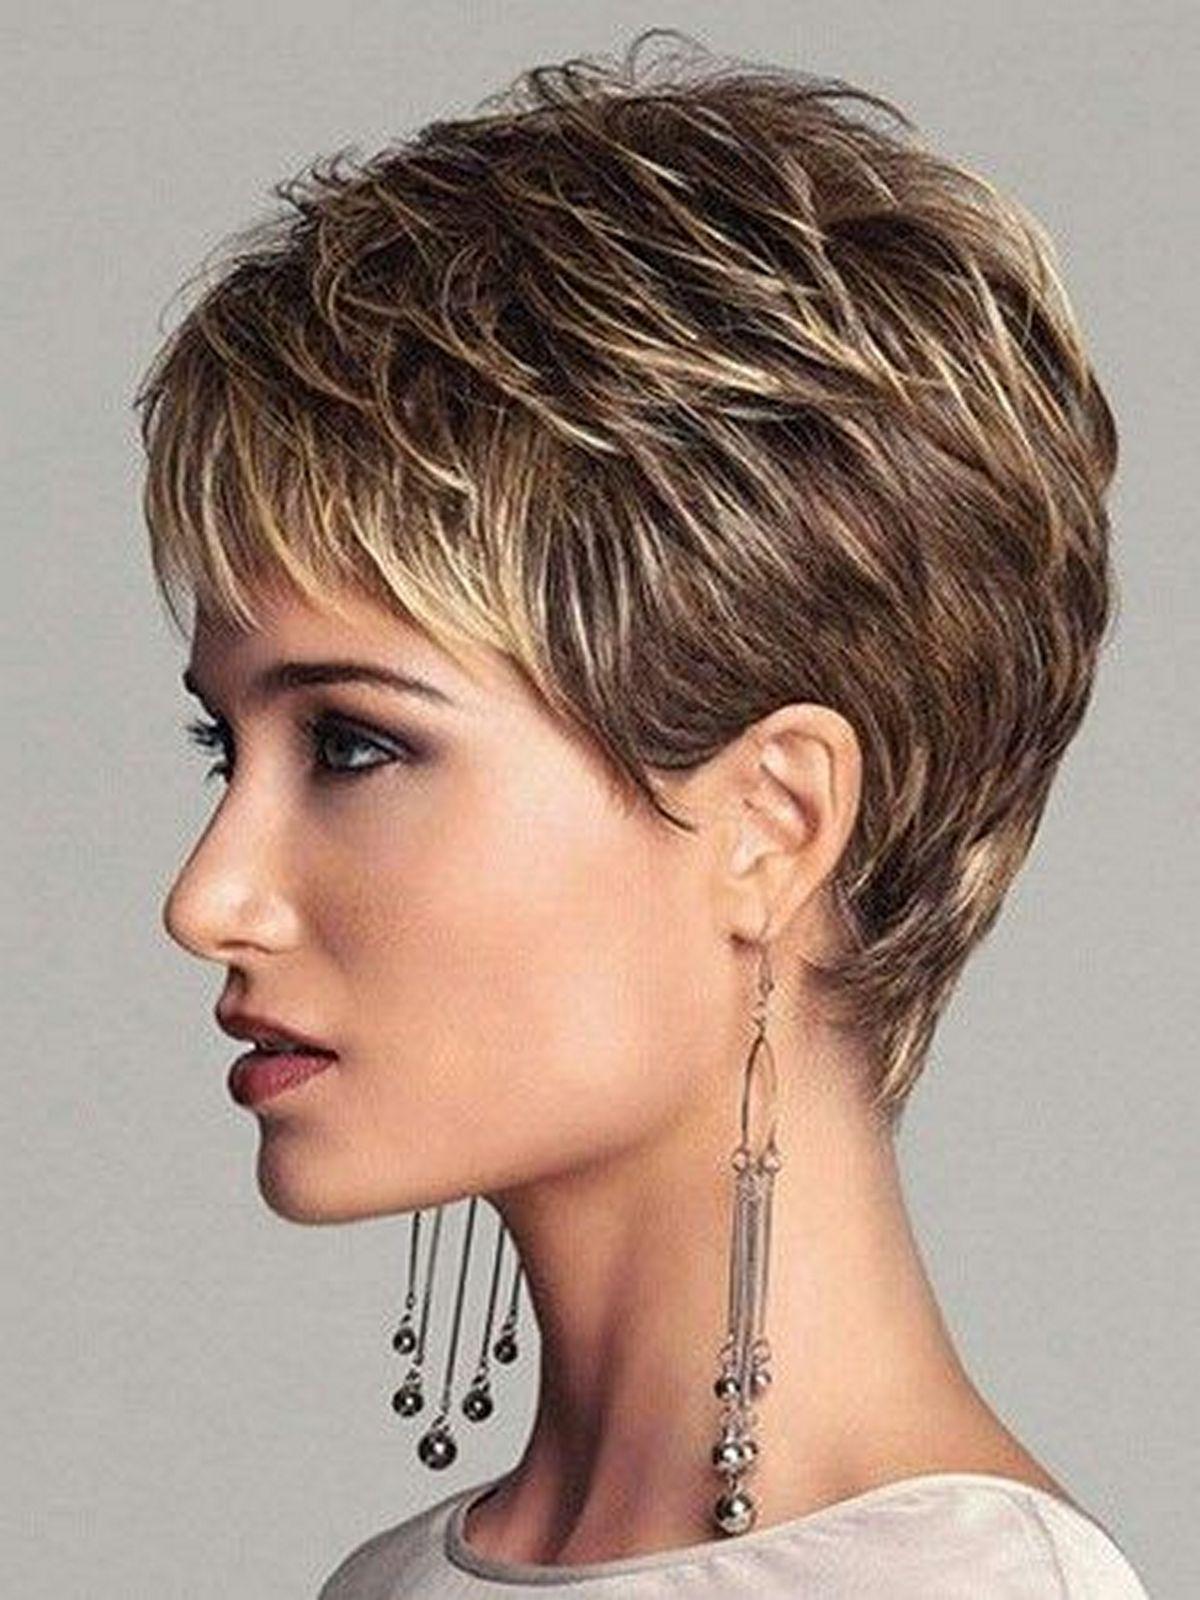 Pixie Haircuts For Women 53 Short Haircut Styles Short Hair Styles Pixie Haircut For Thick Hair